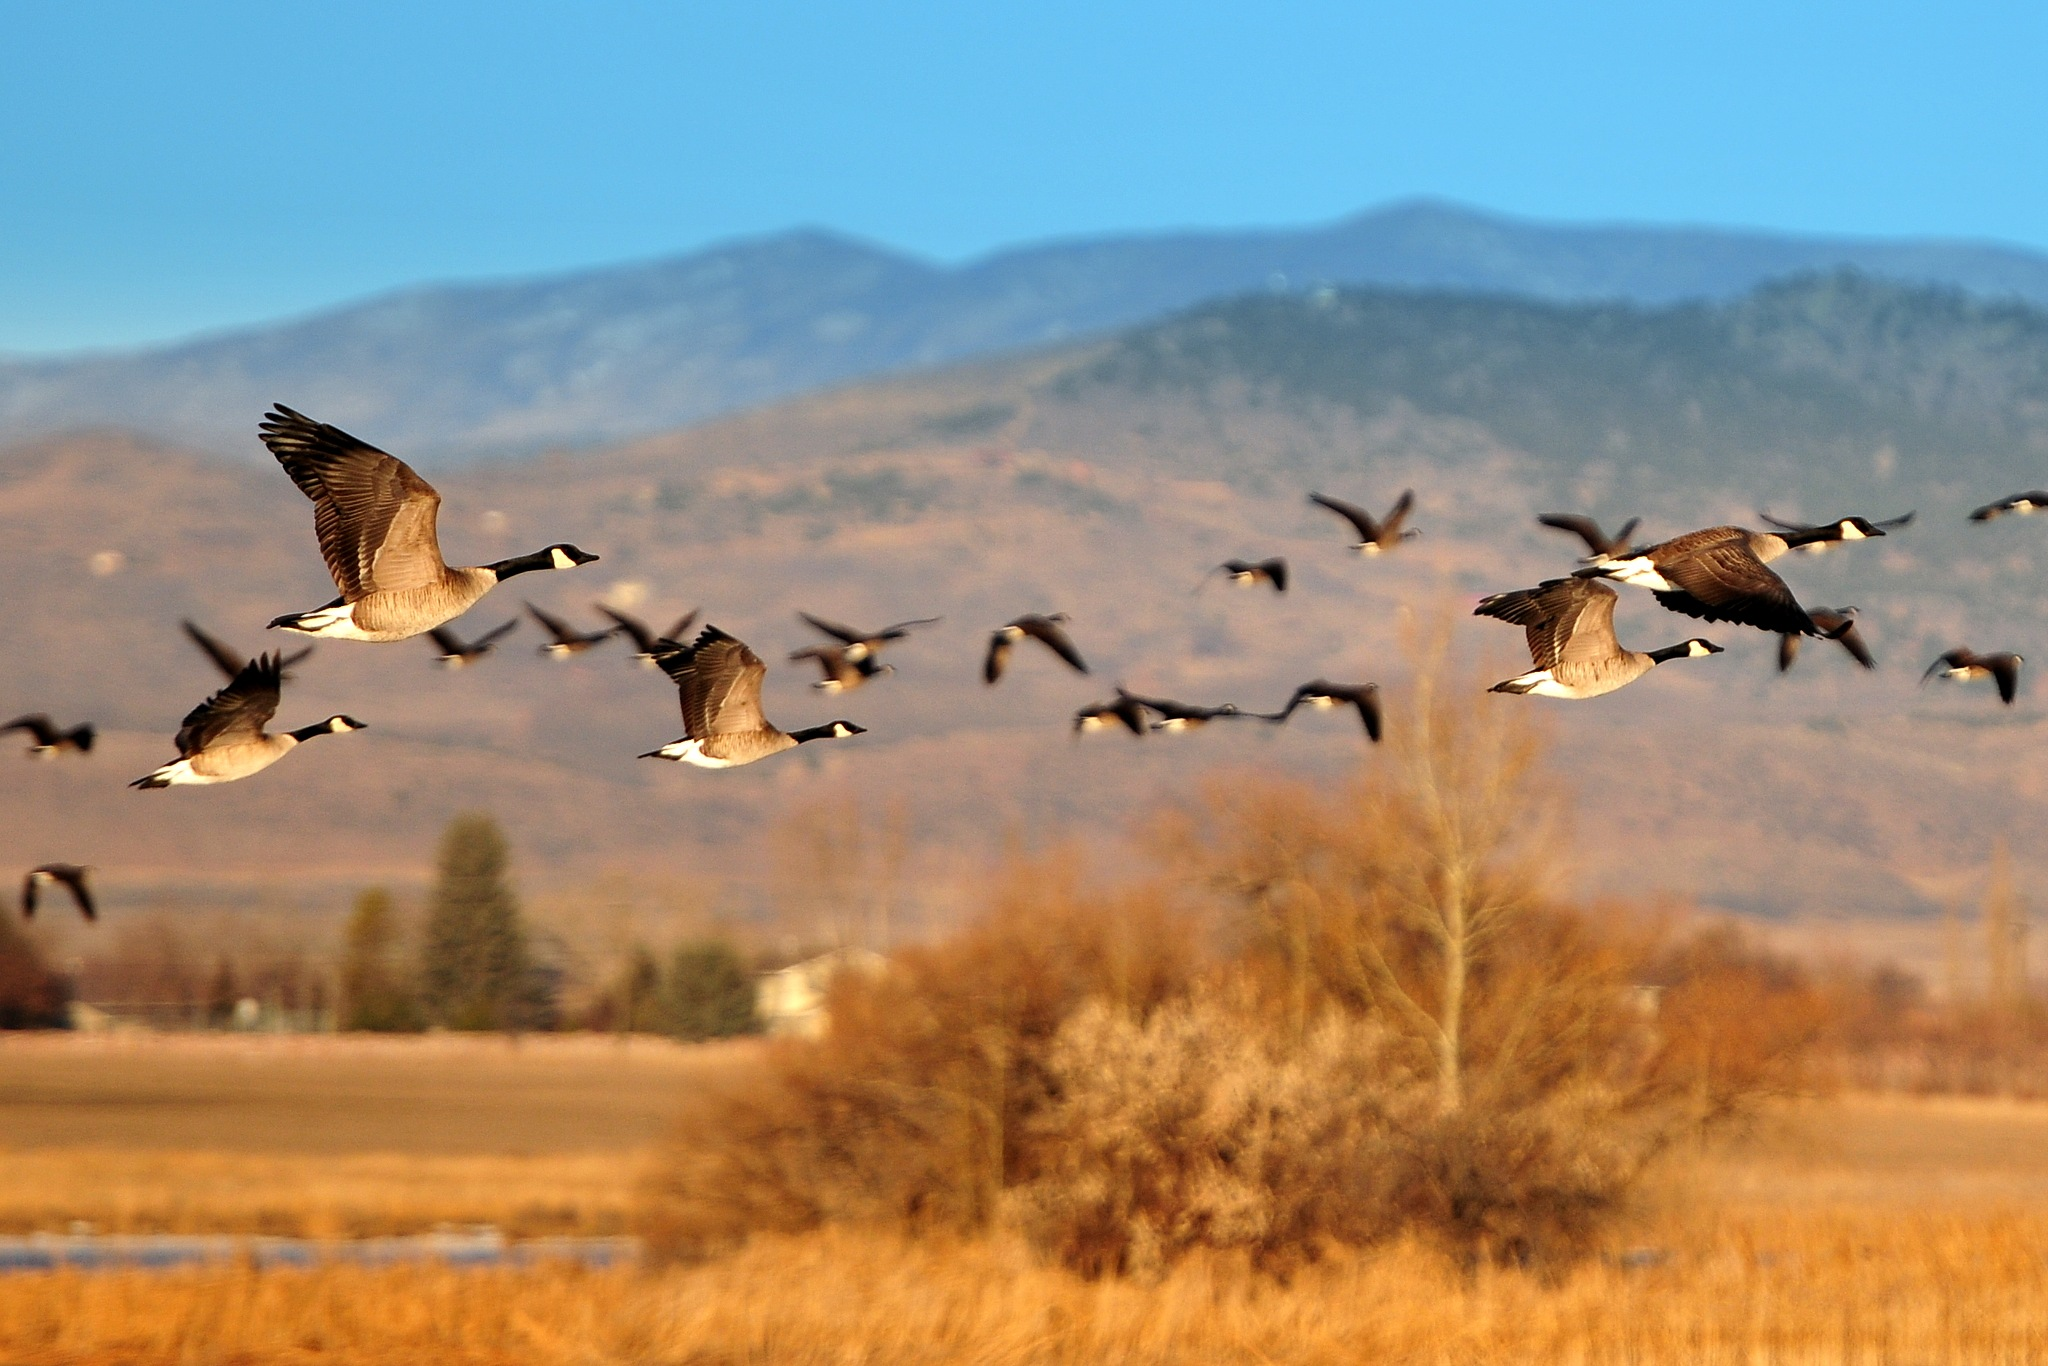 Geese in Flight by Ken Dobbs